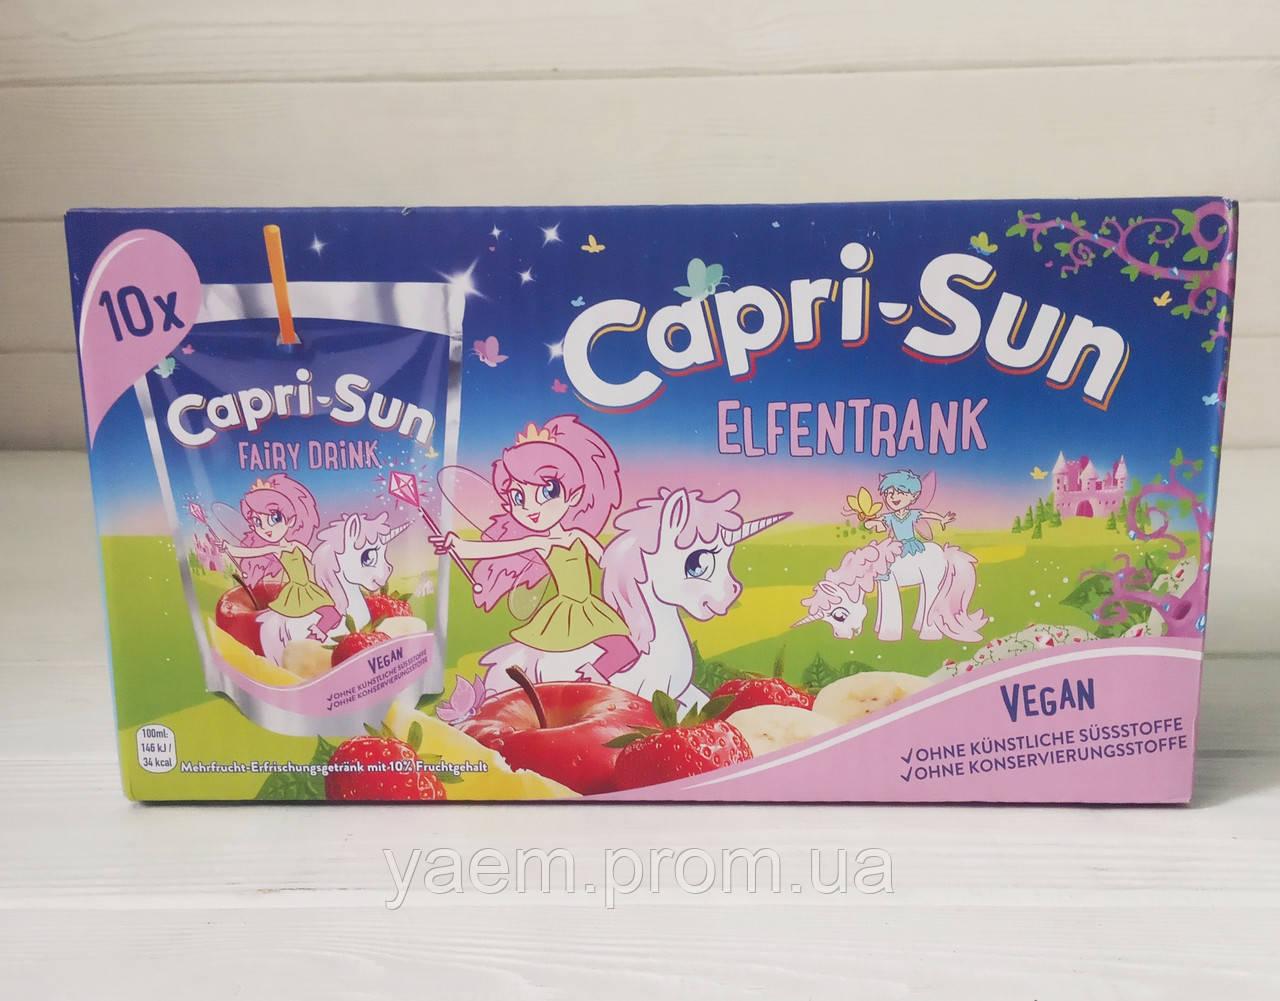 Сок с трубочкой Capri-Sun Fairy Drink (коробка 10шт*200ml) (Германия)